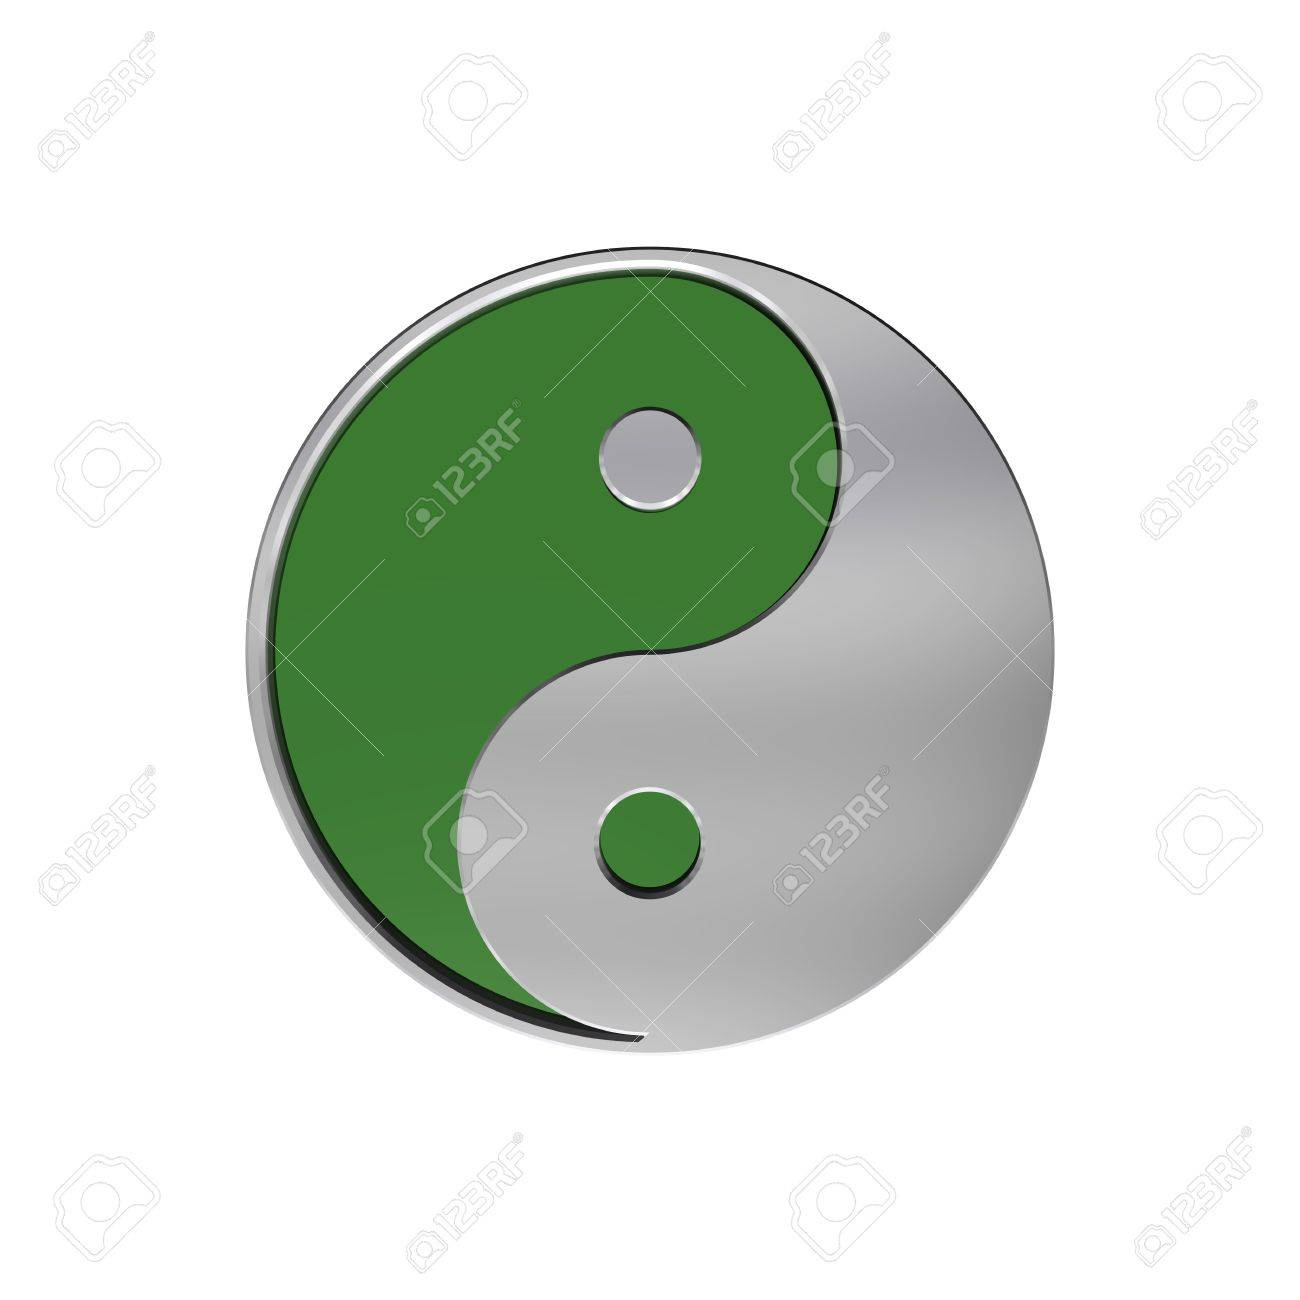 Chrome Tai Chi Yin Yang Sign Computer Generated 3d Photo